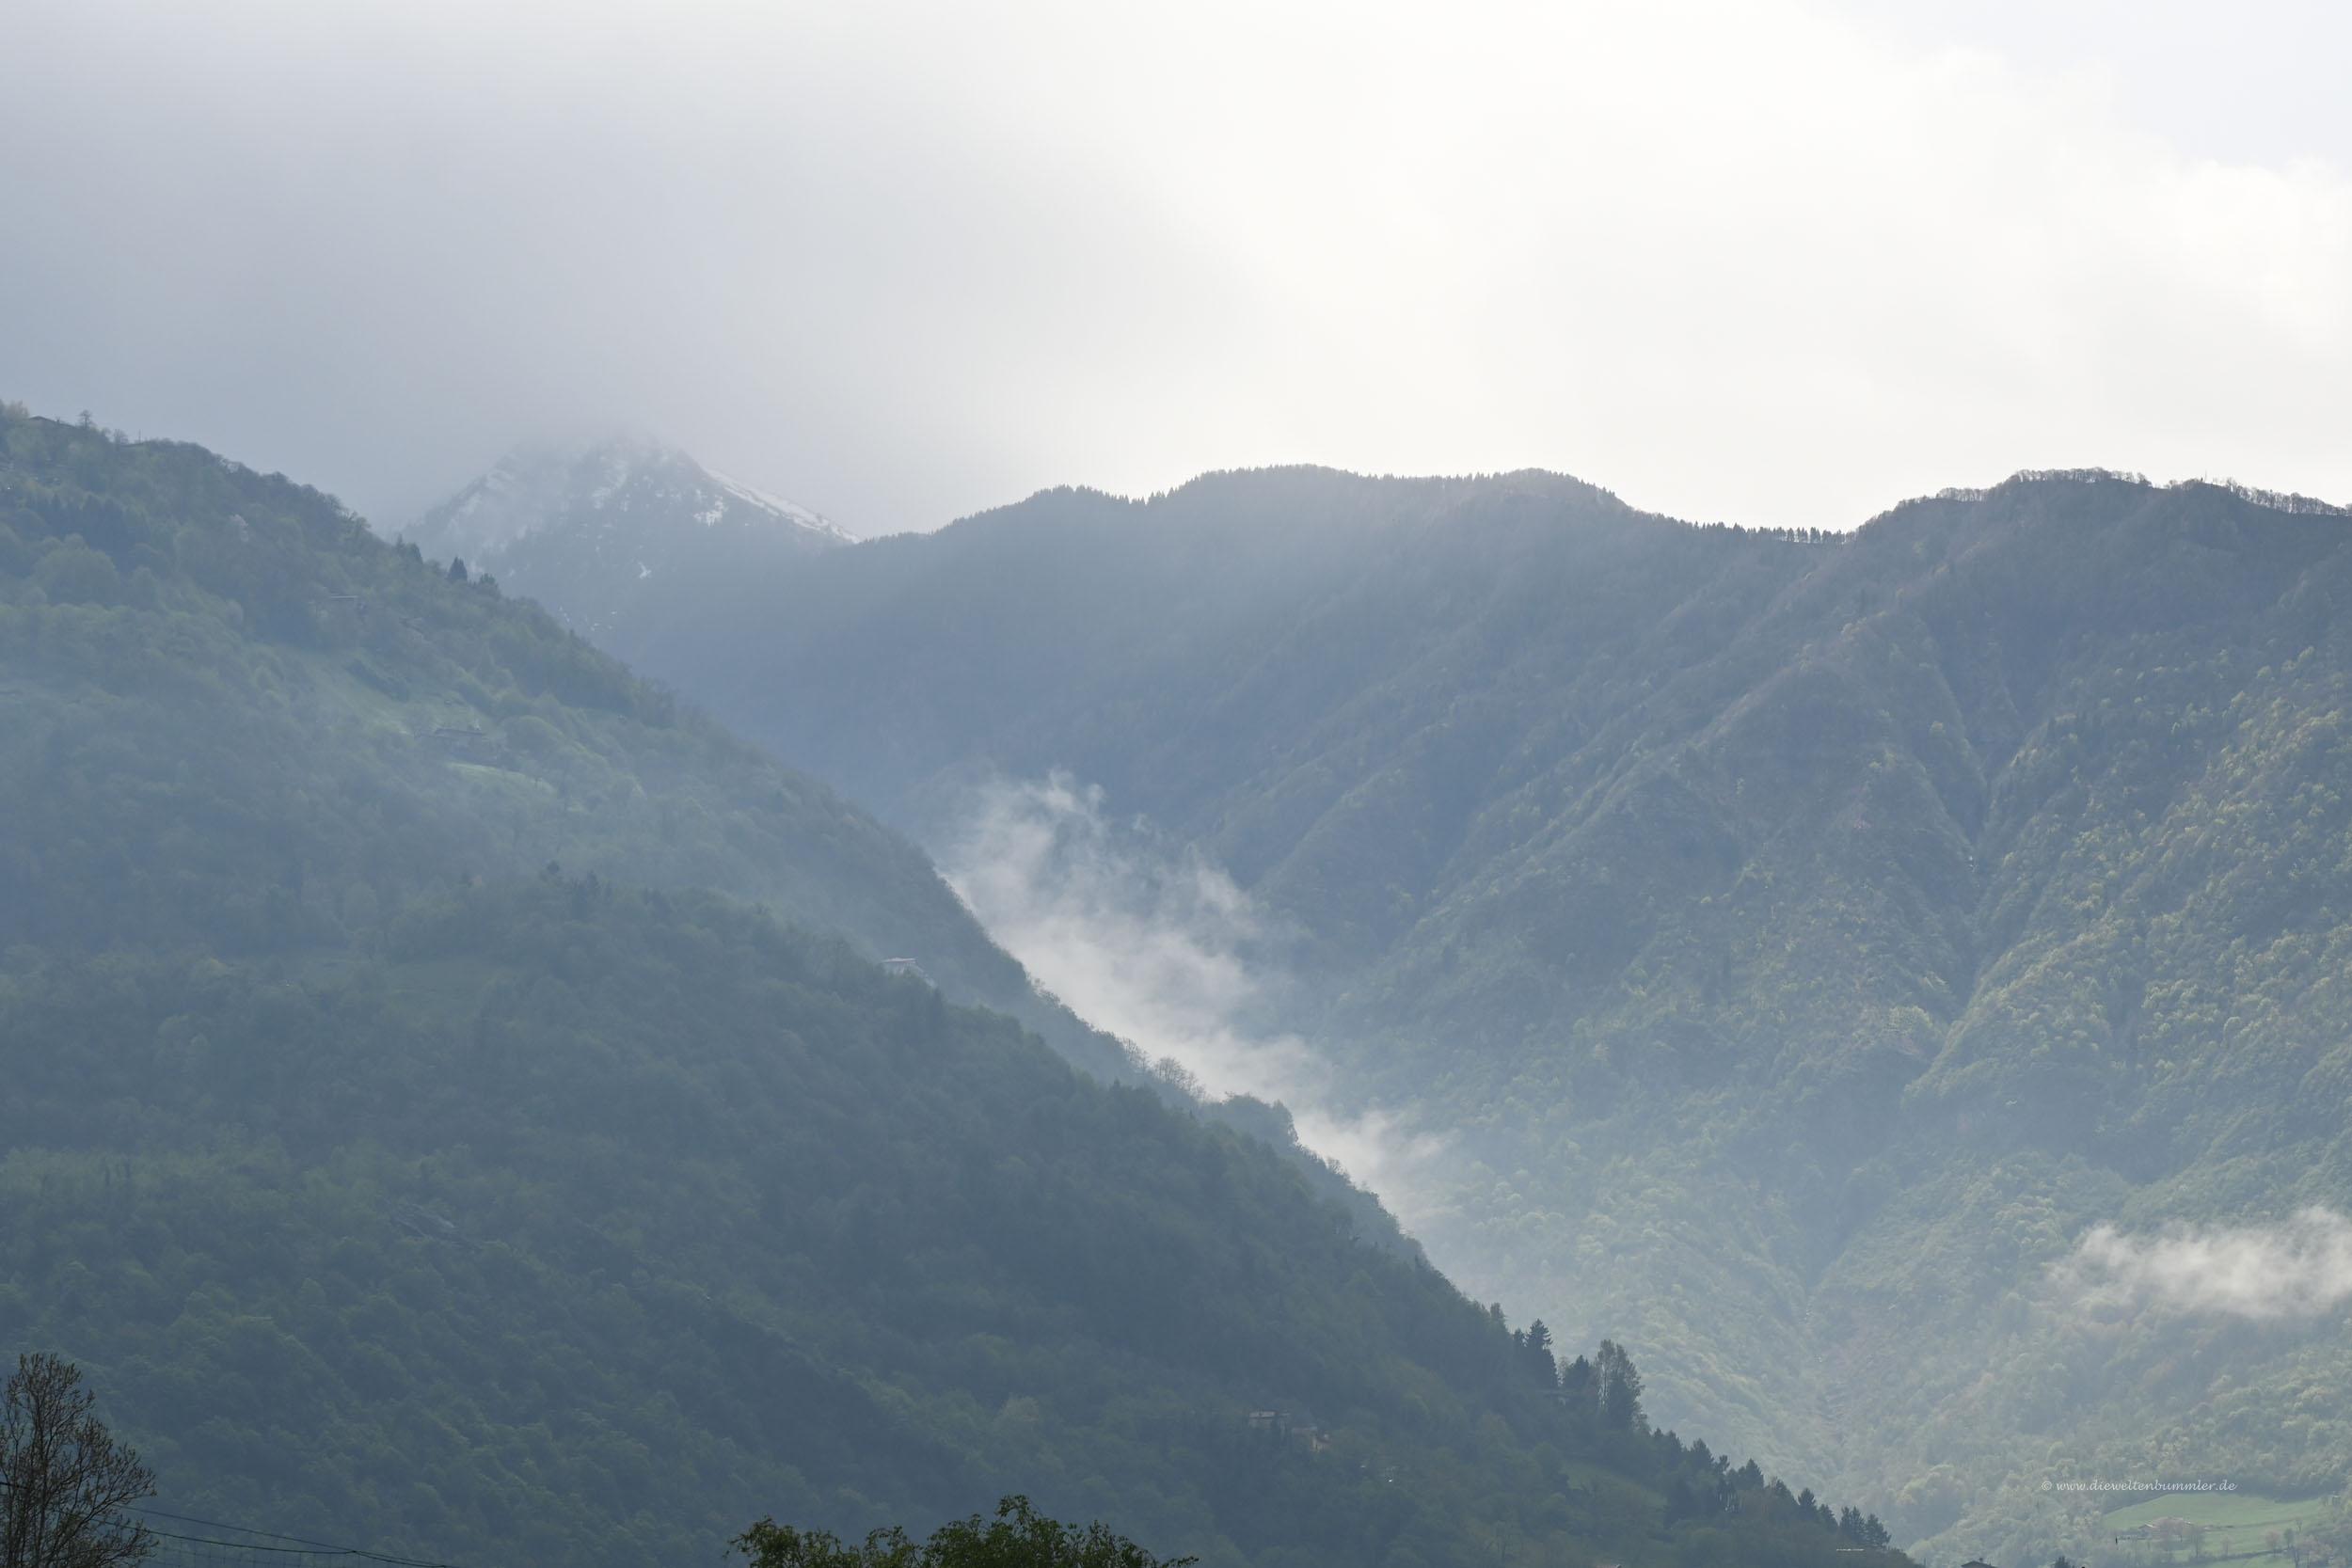 Wolkenverhangene Berge